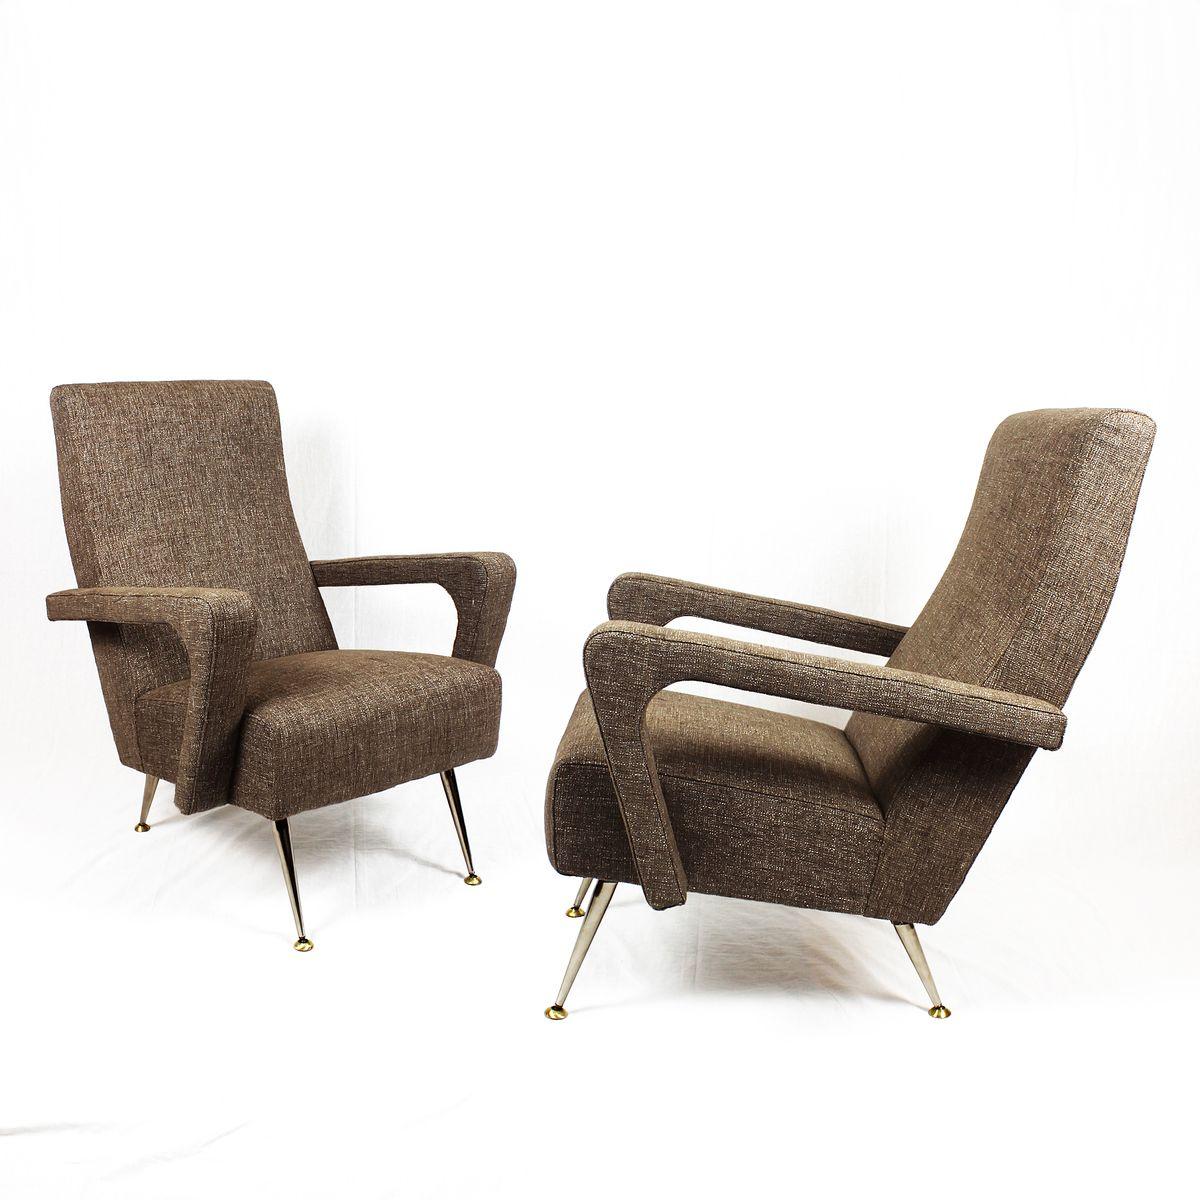 Beige Mid-Century Leinen und Aluminium Sessel, 1950er, 2er Set